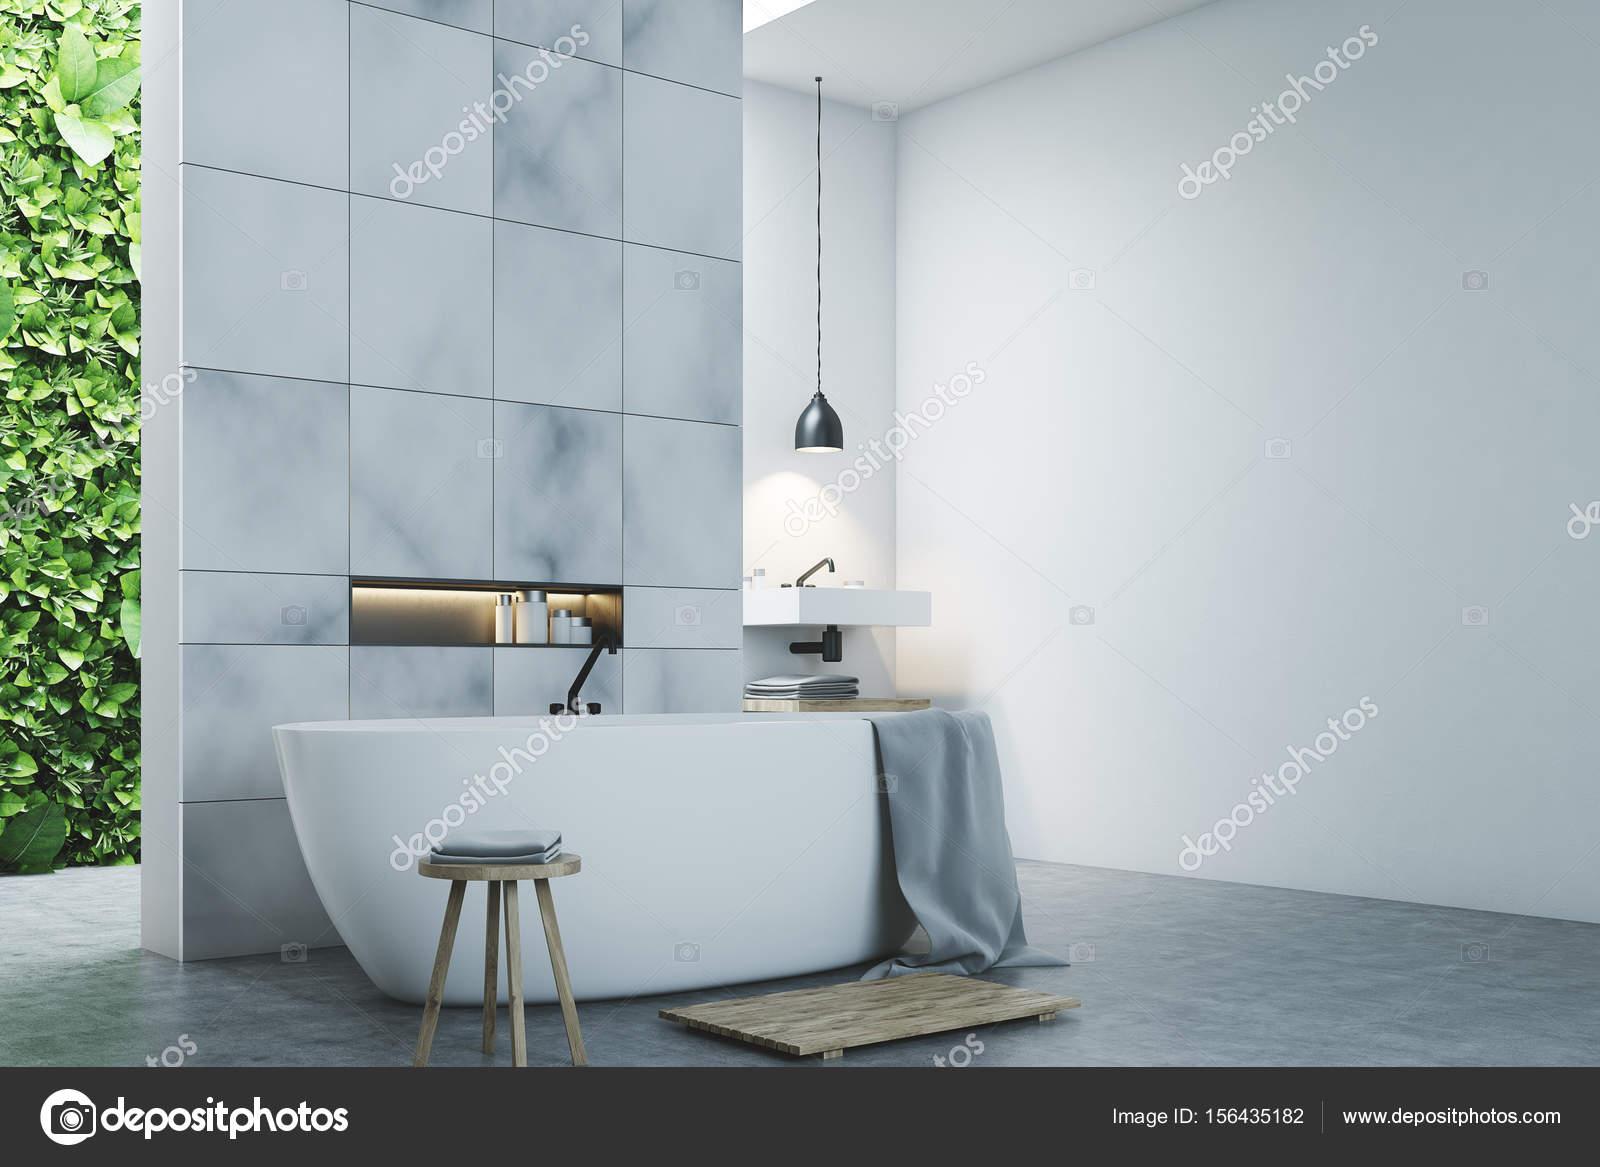 Marmer Tegels Badkamer : Eco badkamer twee putten marmer tegels kant u stockfoto